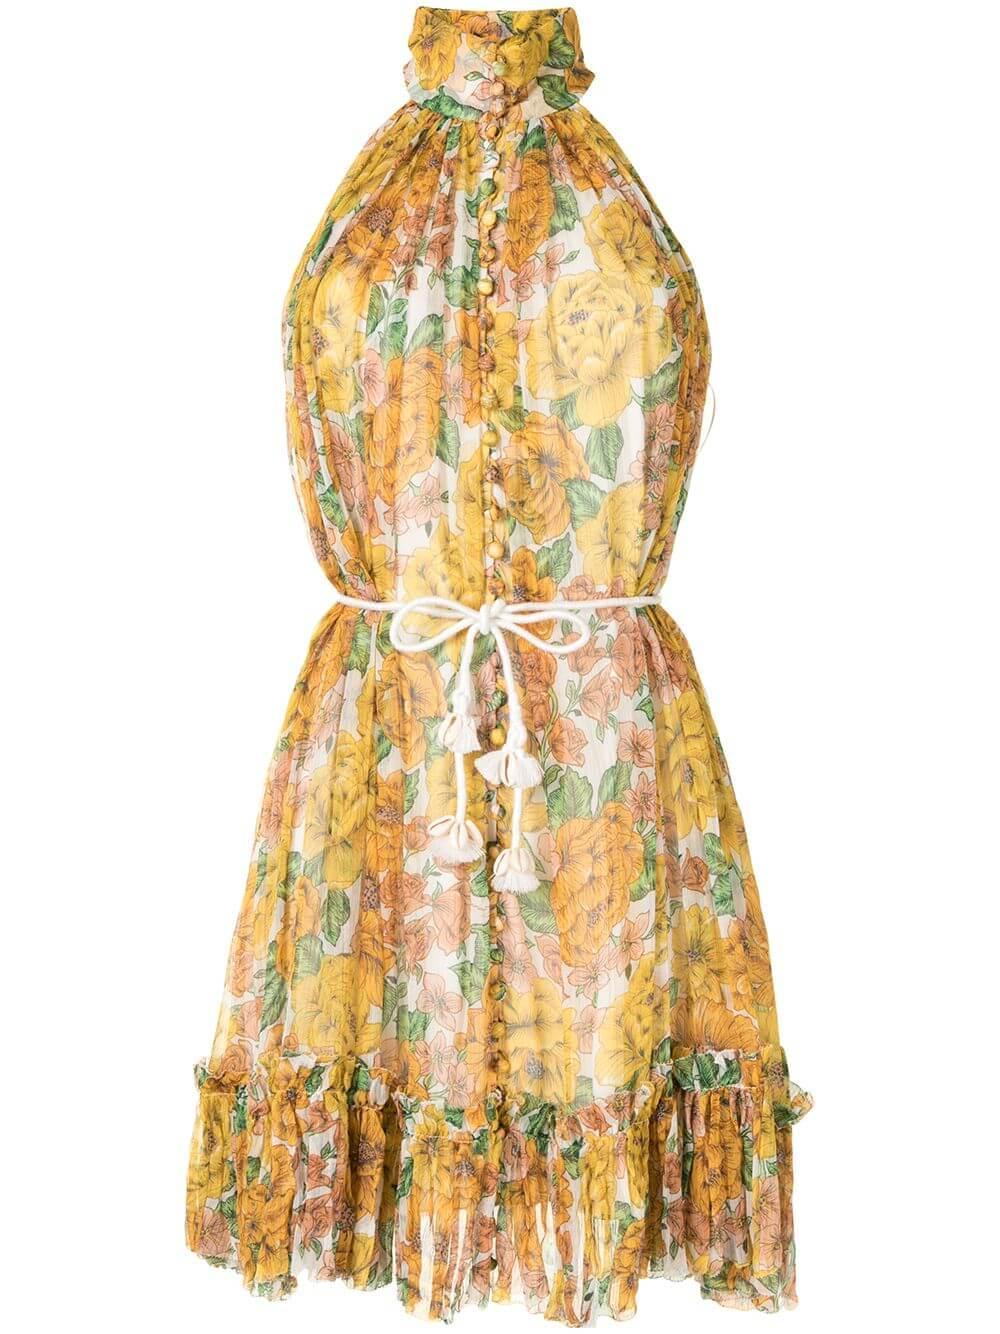 Poppy Halter Dress